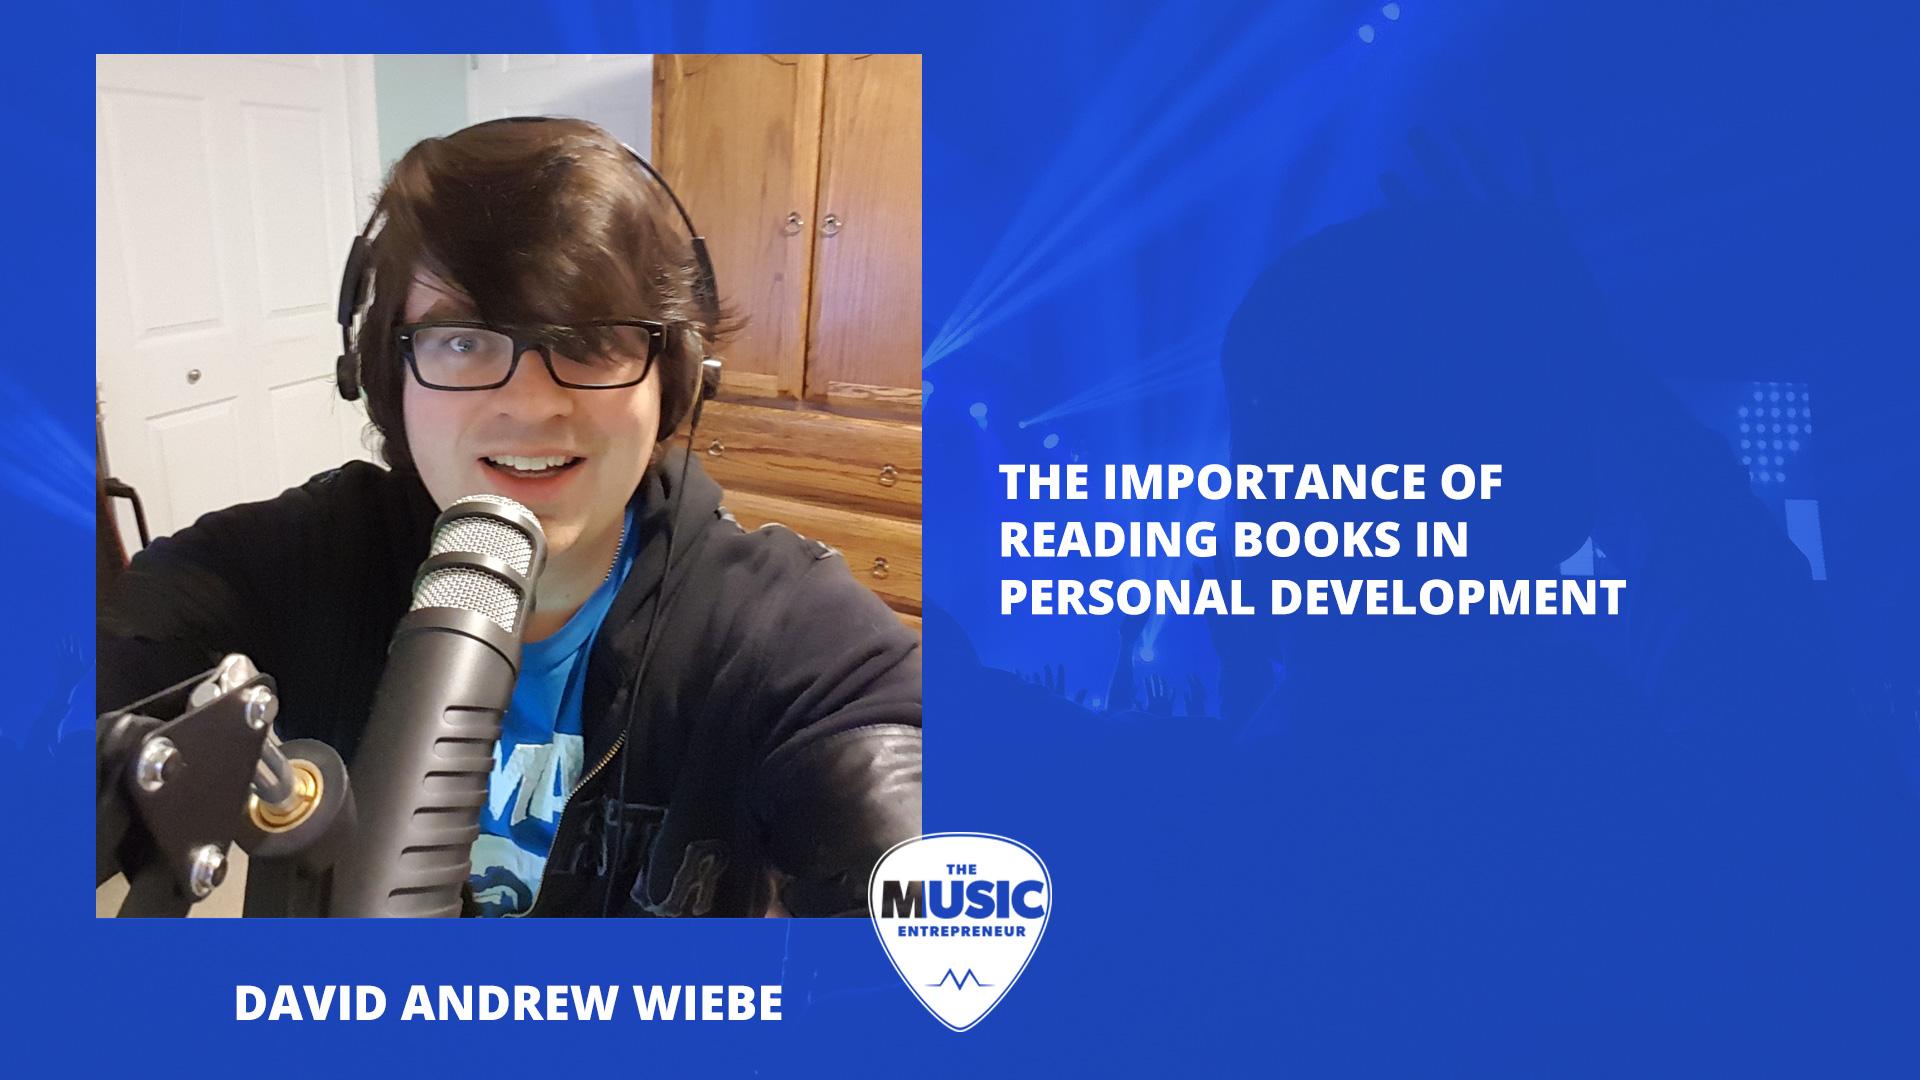 value of books speech